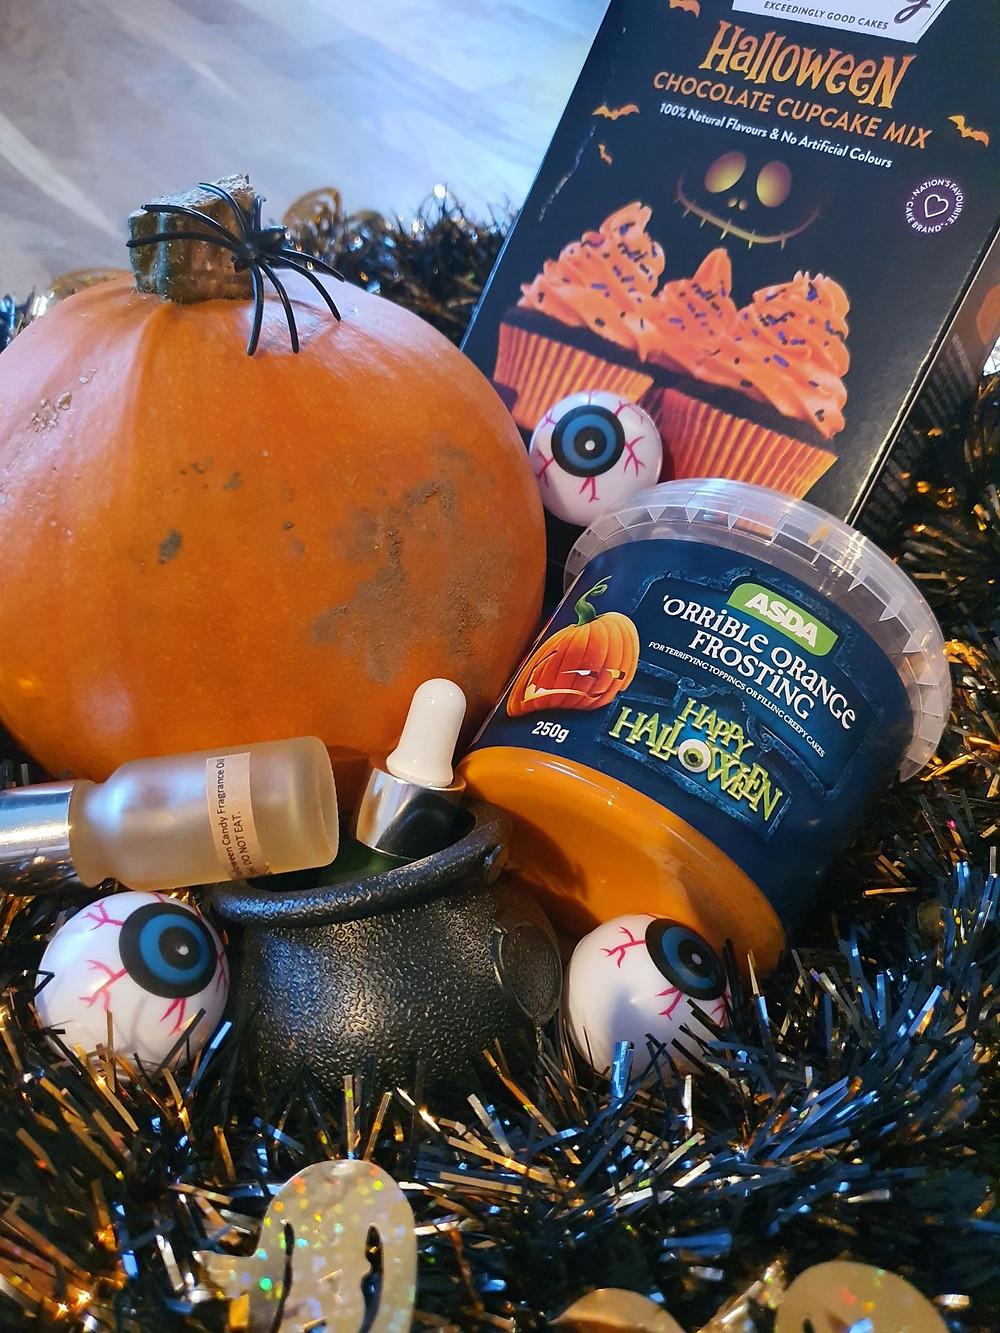 Cupcake, mr kipling, cake, eyeball, pumpkin, el unico, elunico, icing, orange